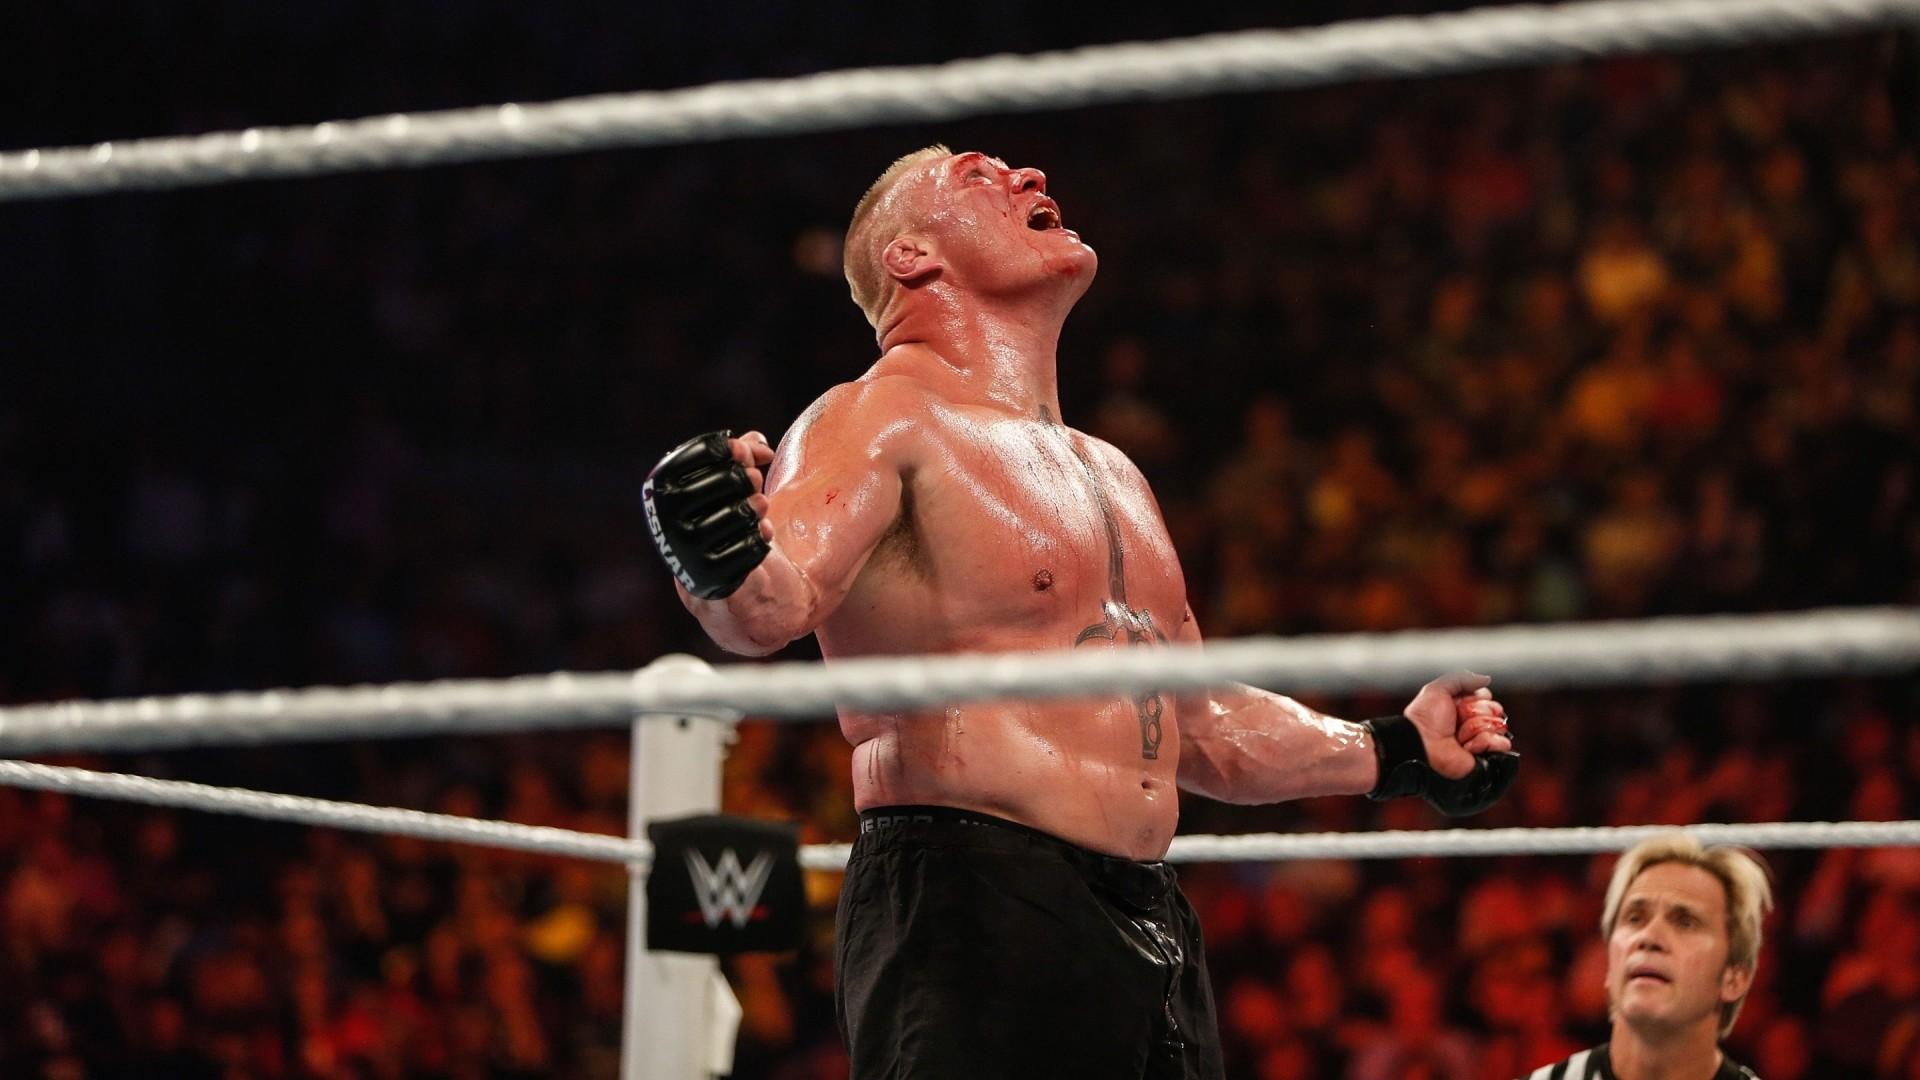 Brock Lesnar Dethrones John Cena As Highest-paid Wrestler in 2017 According  to Forbes